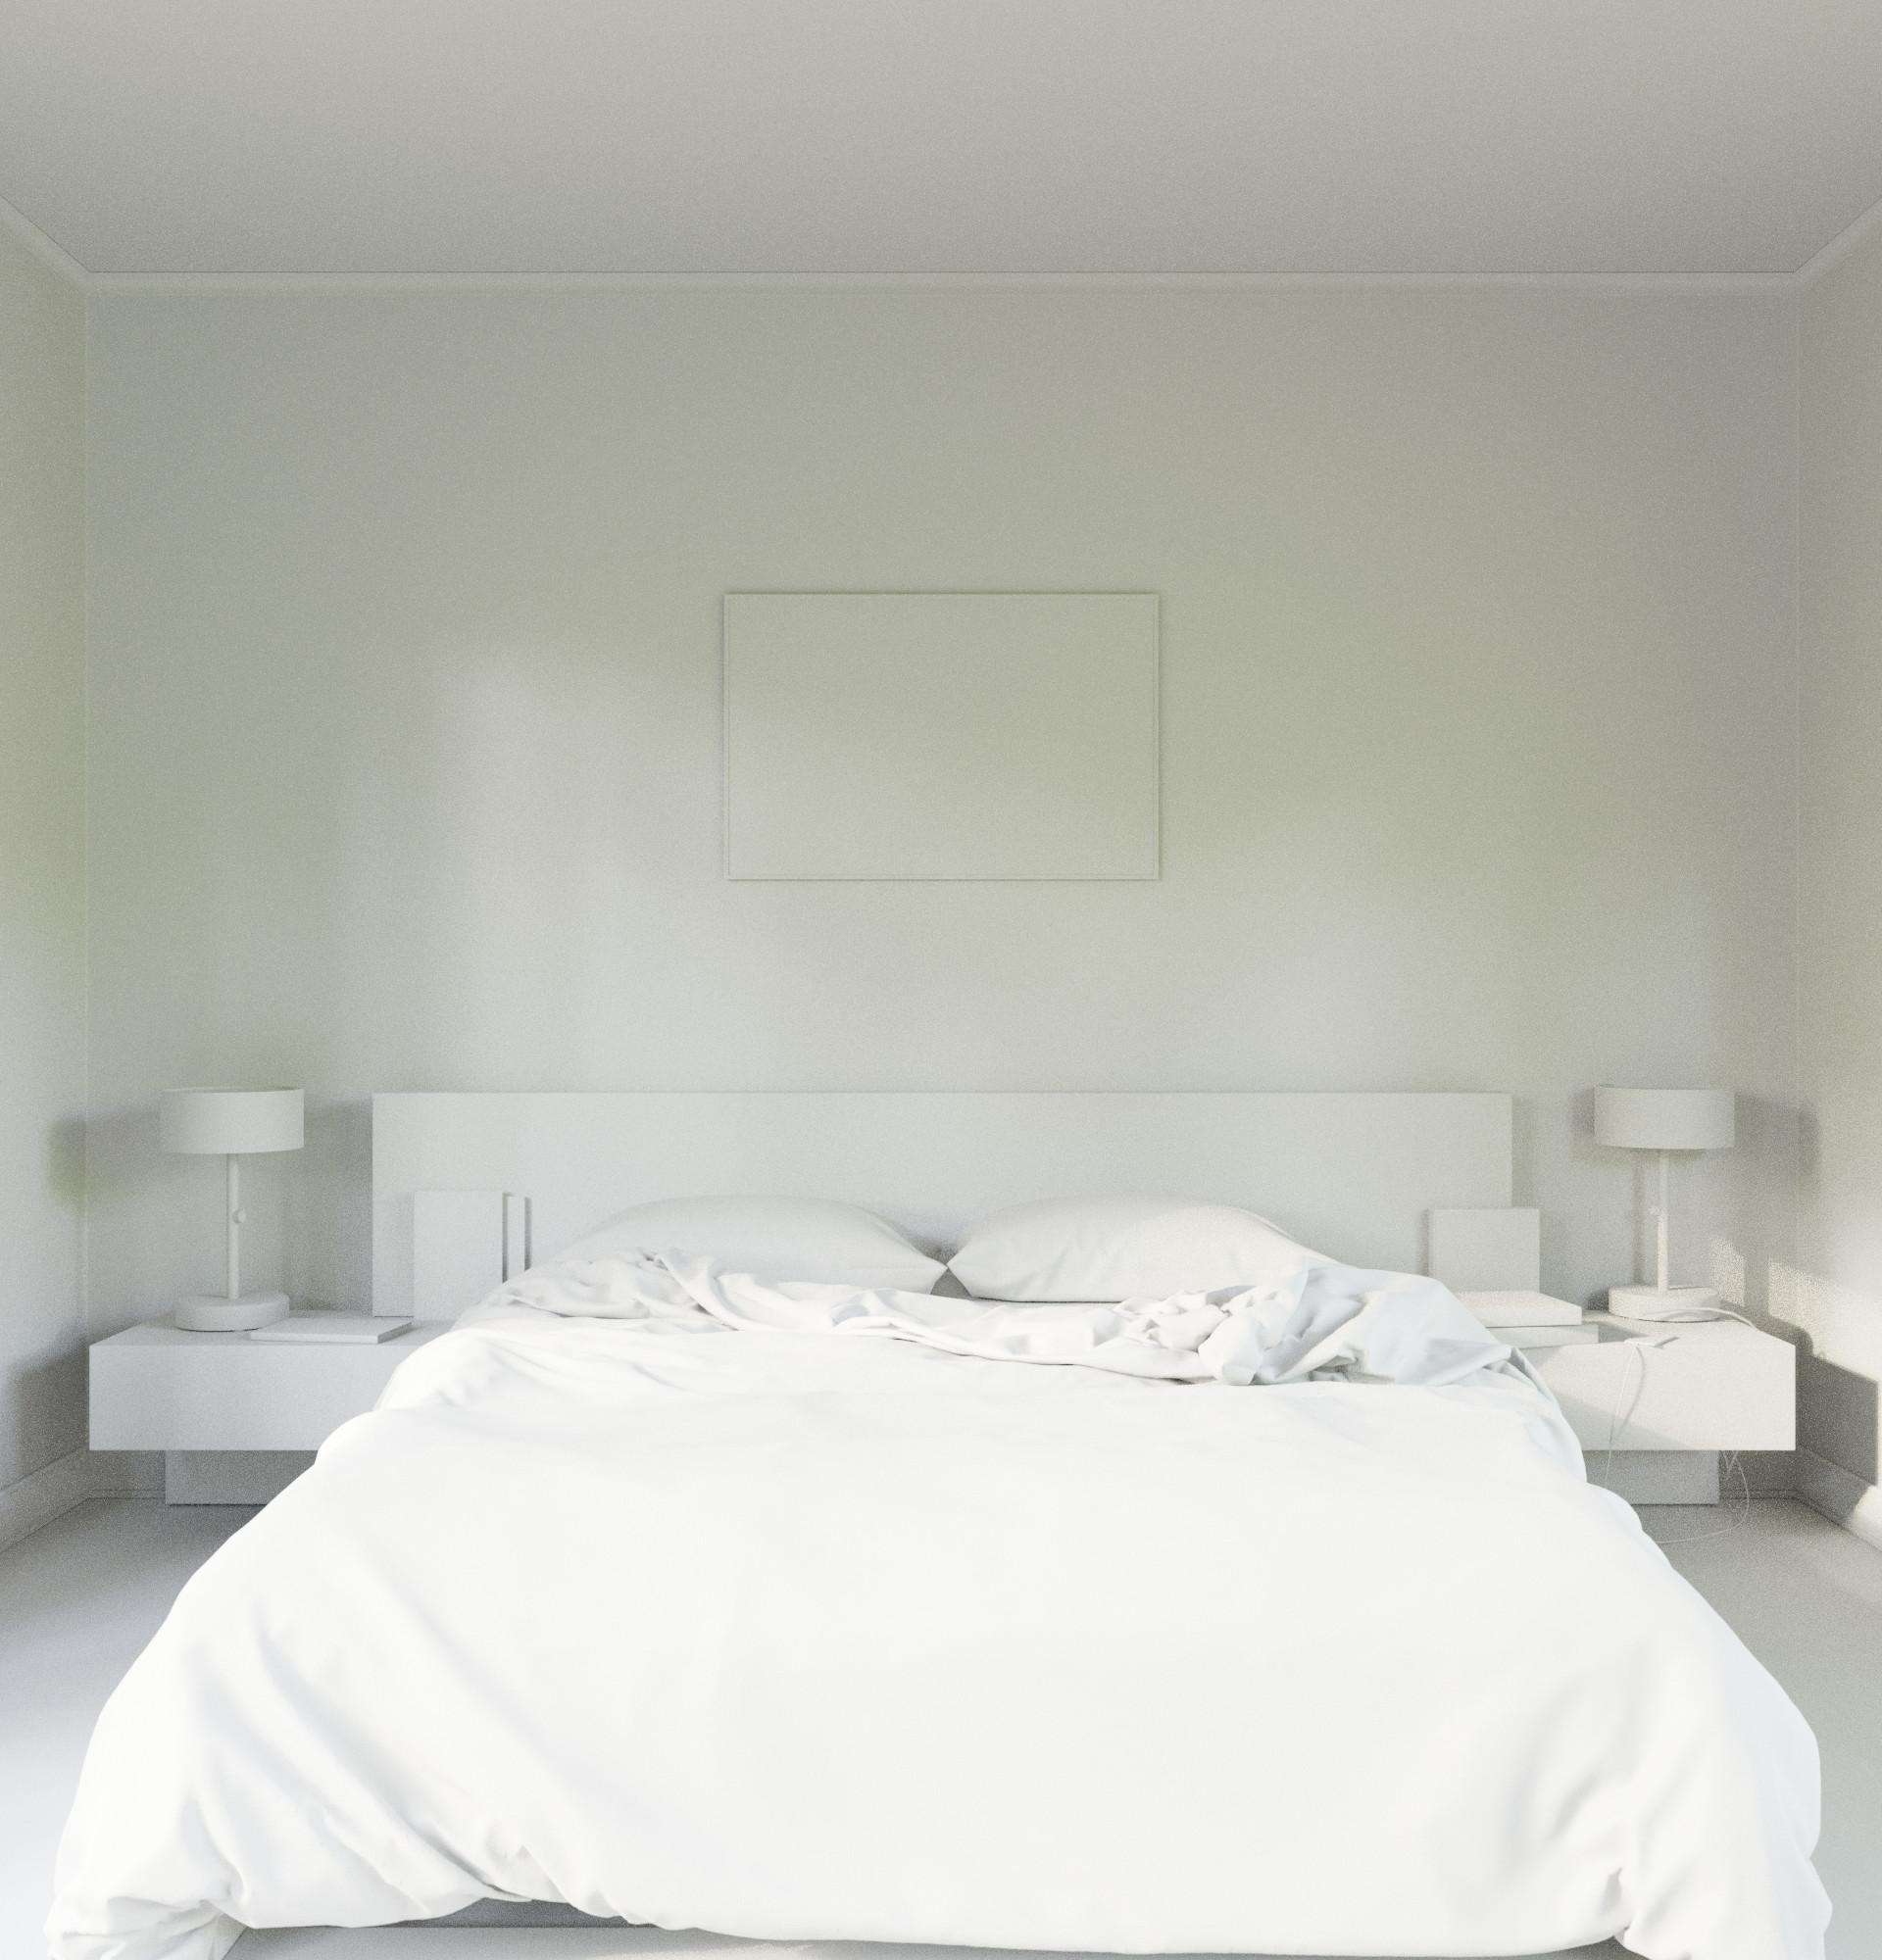 Patterned Bedroom - Clay Render